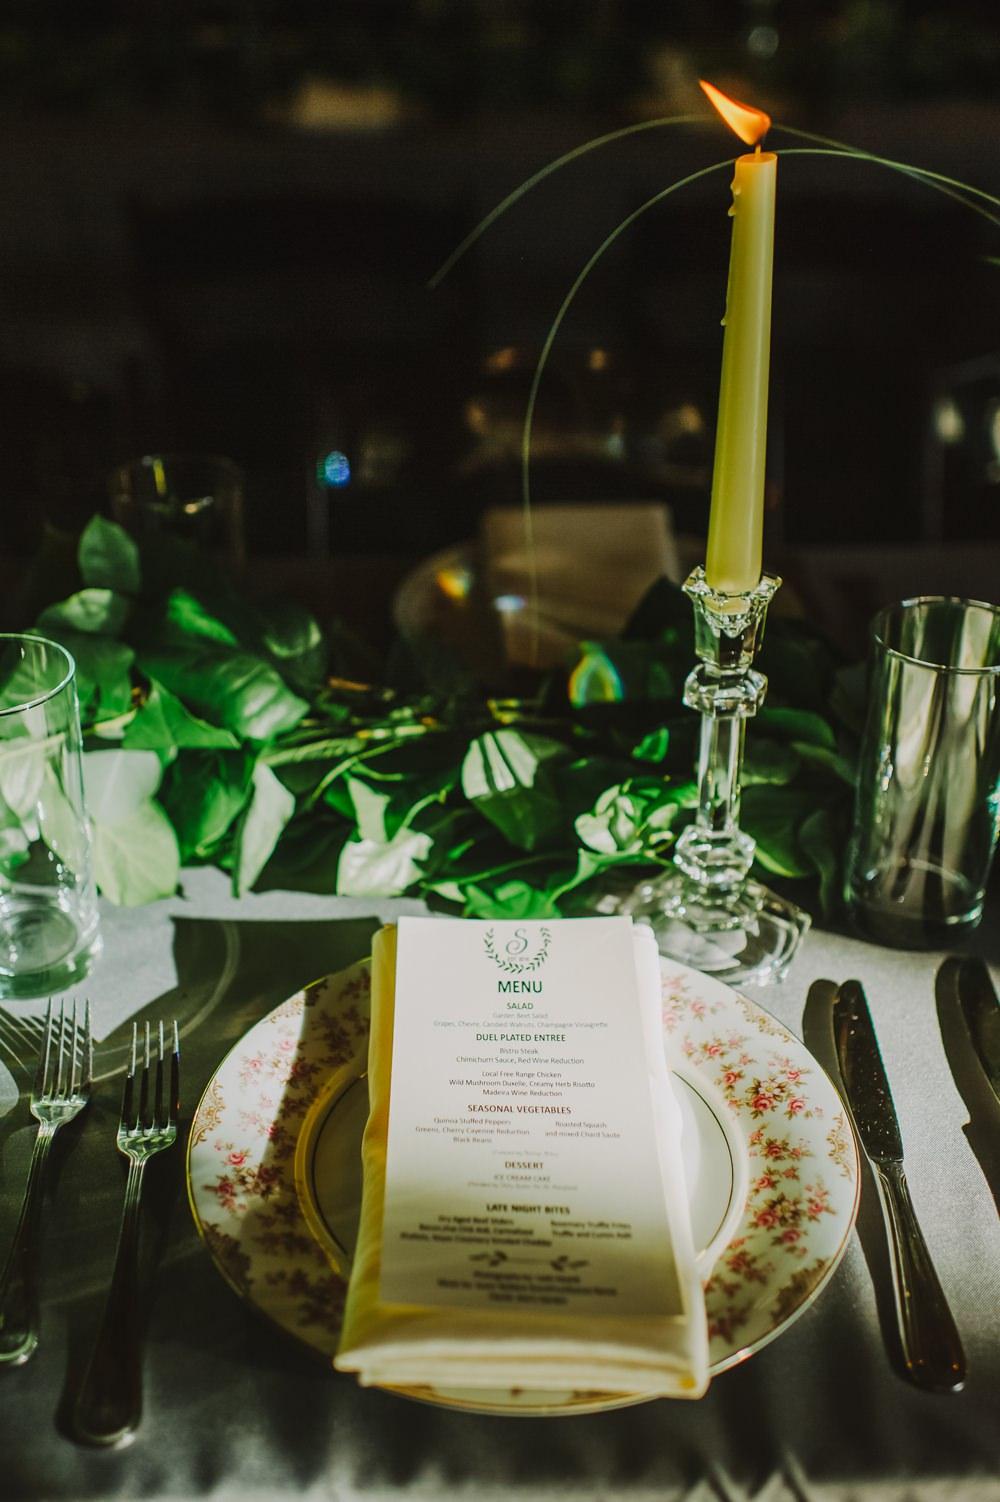 Place Setting China Plates Candles Greenery Maryland Wedding L. Hewitt Photography